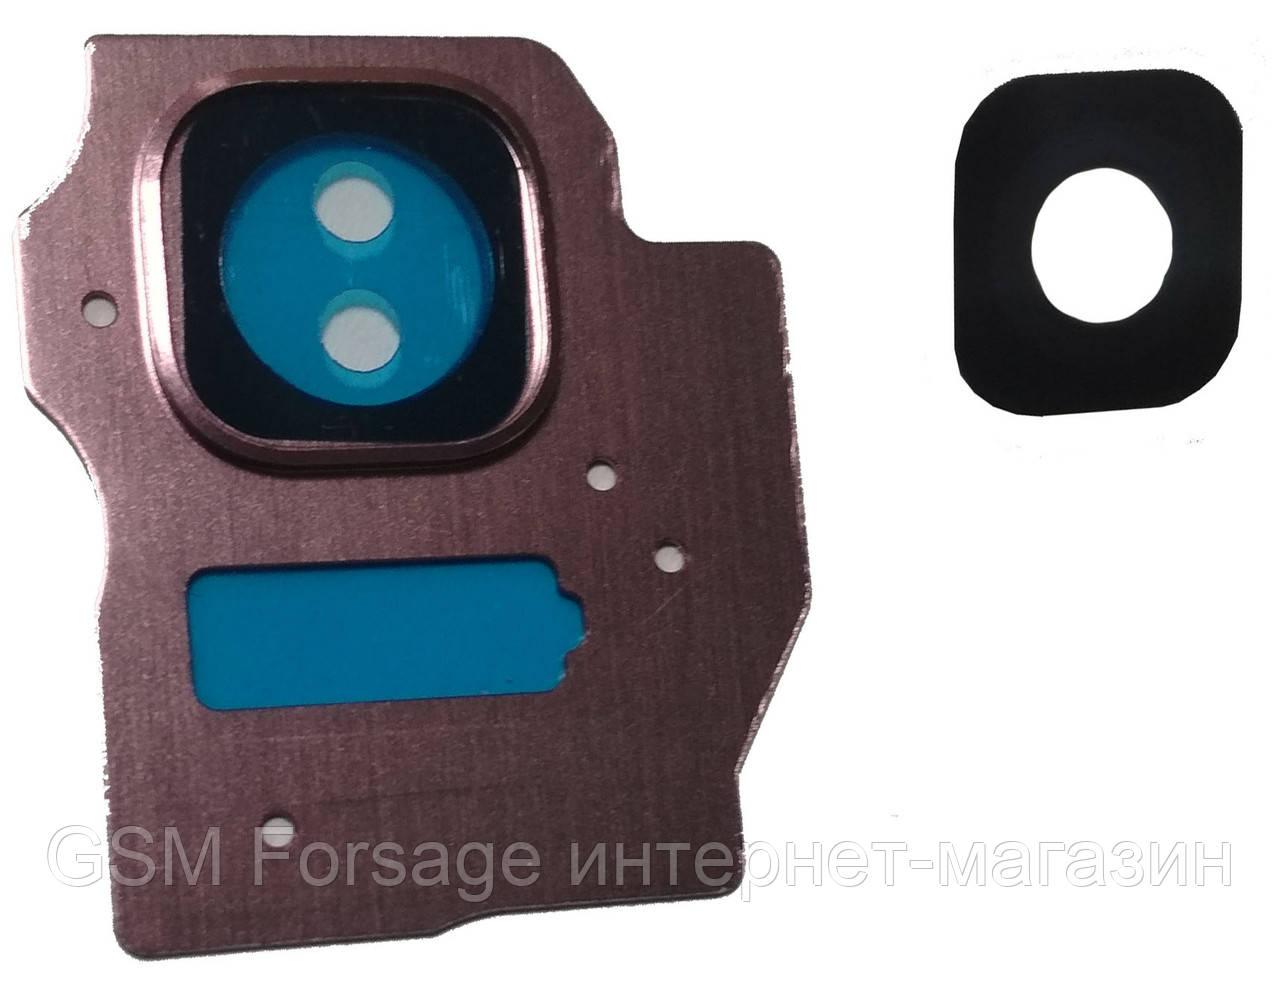 Стекло камеры Samsung Galaxy S8 Plus G955 Rose